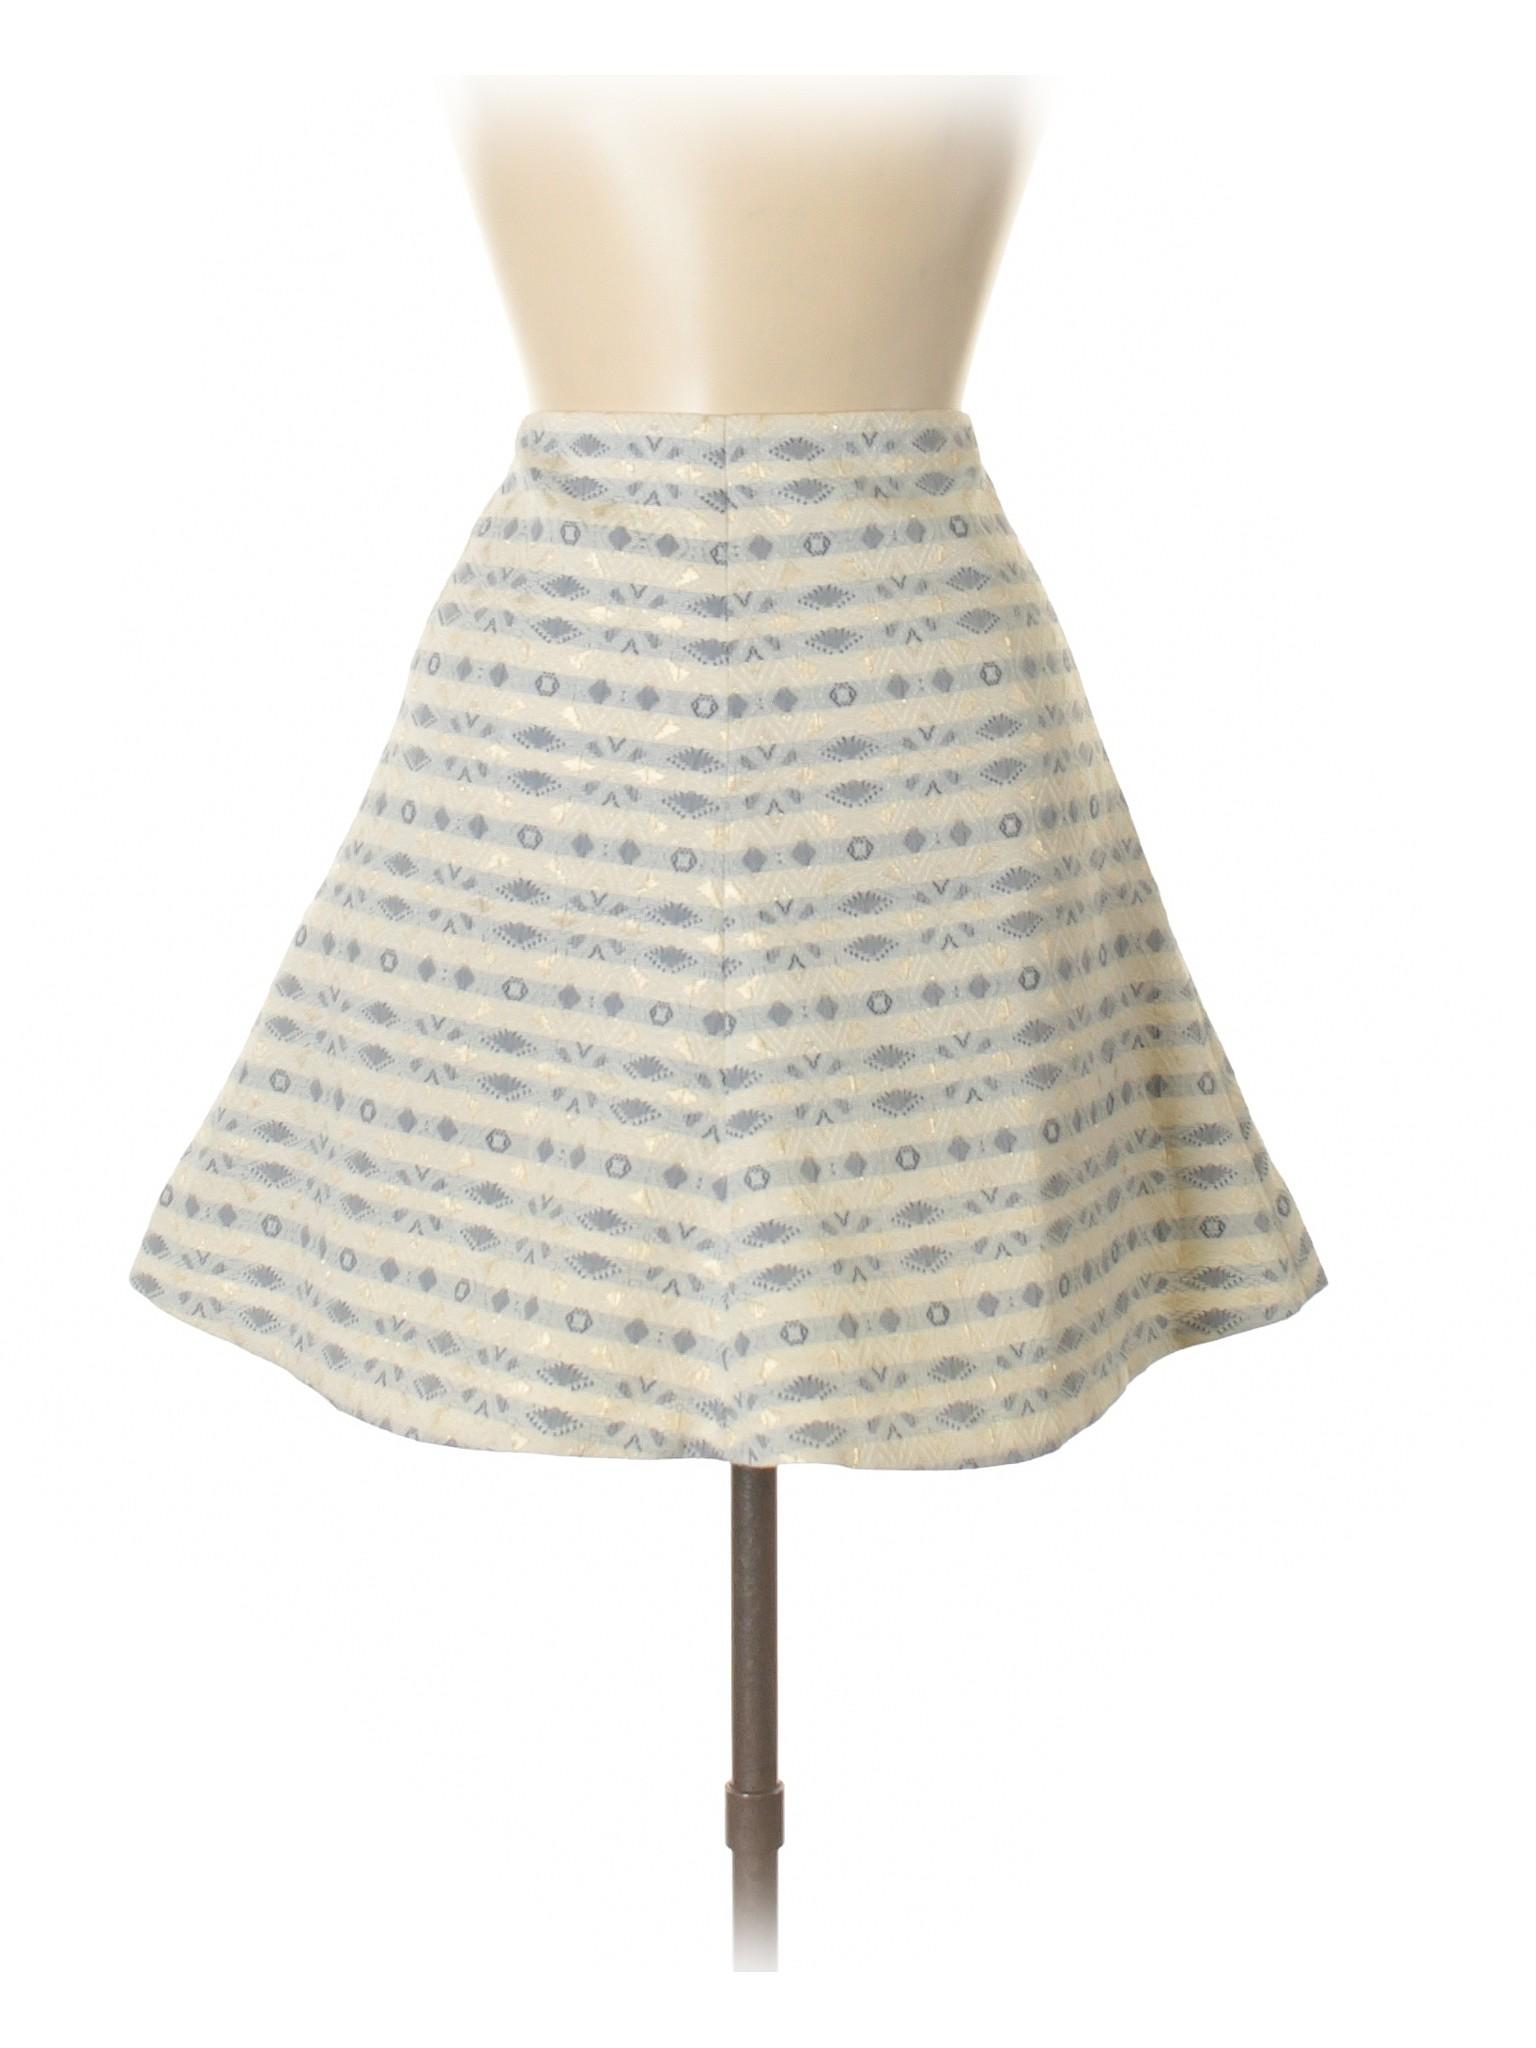 Store winter Skirt Leisure Crew J Formal Factory w0RnIq4C